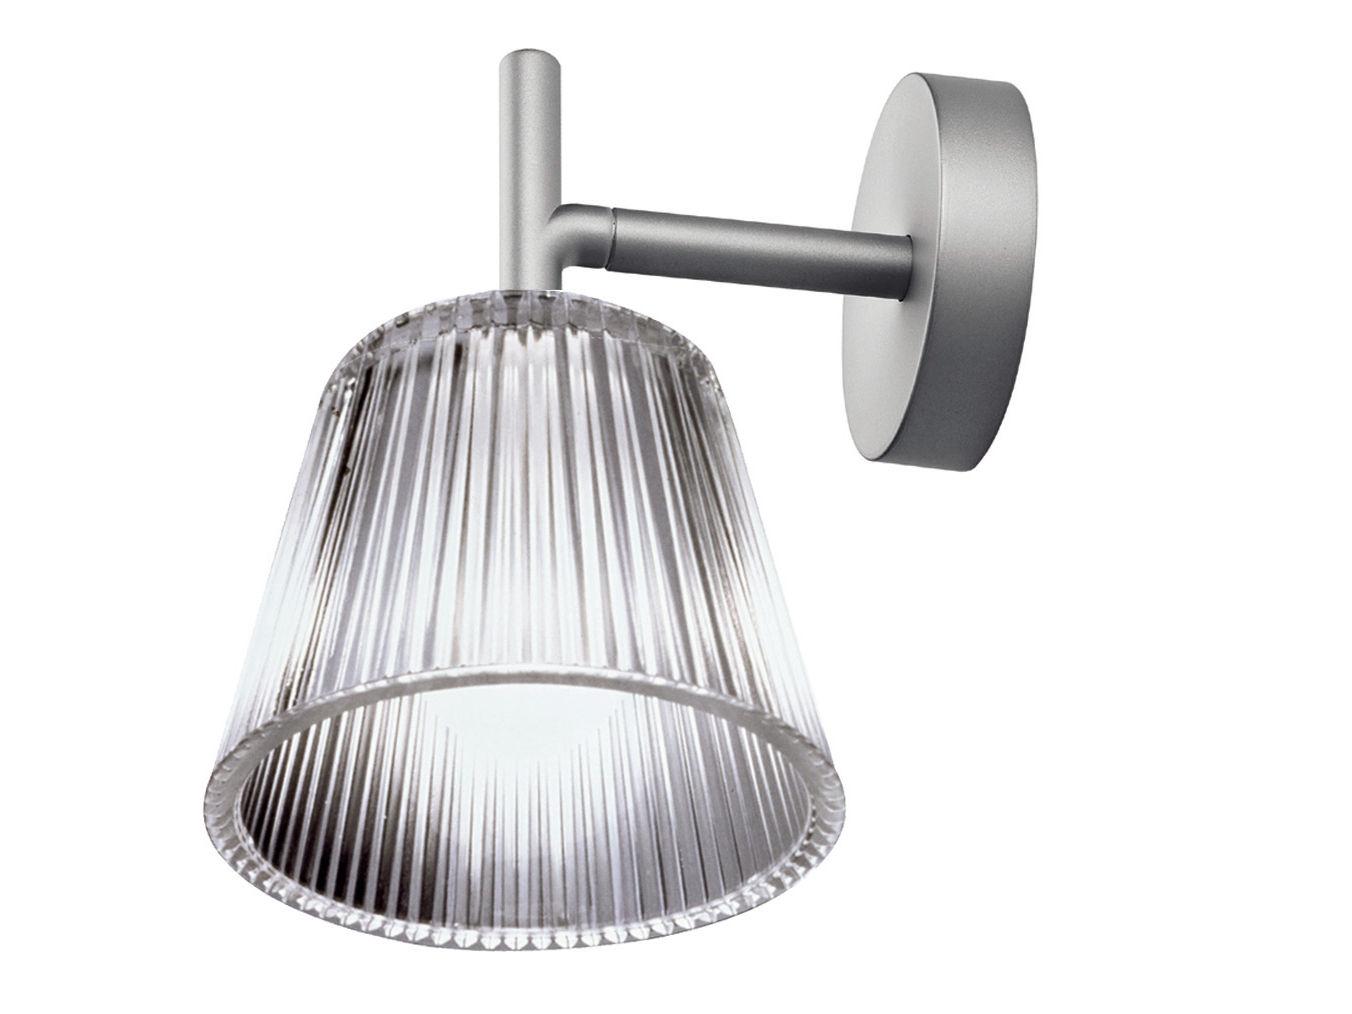 Luminaire - Appliques - Applique Romeo Babe Glass / Version verre - Flos - Verre / Transparent - Verre